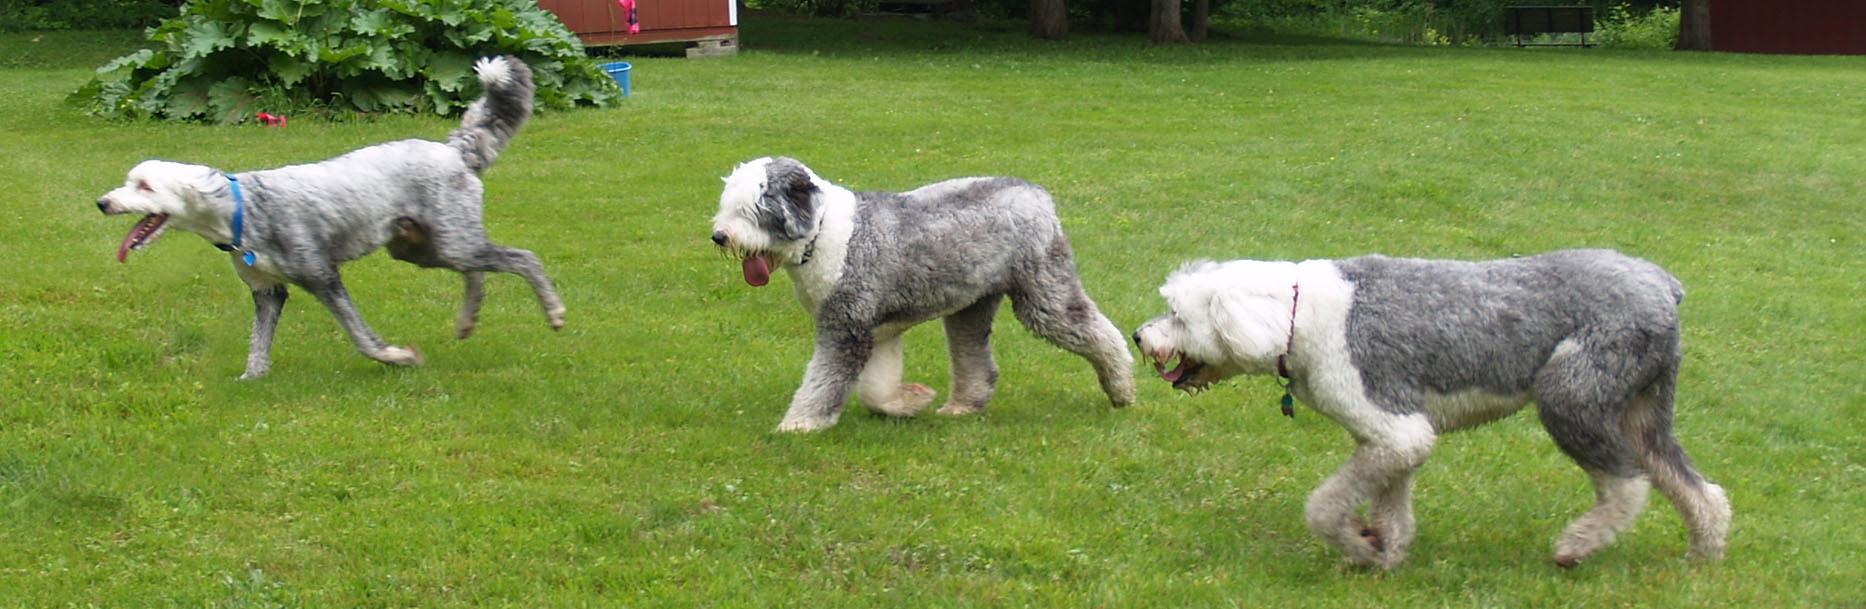 New England Old English Sheepdog Rescue